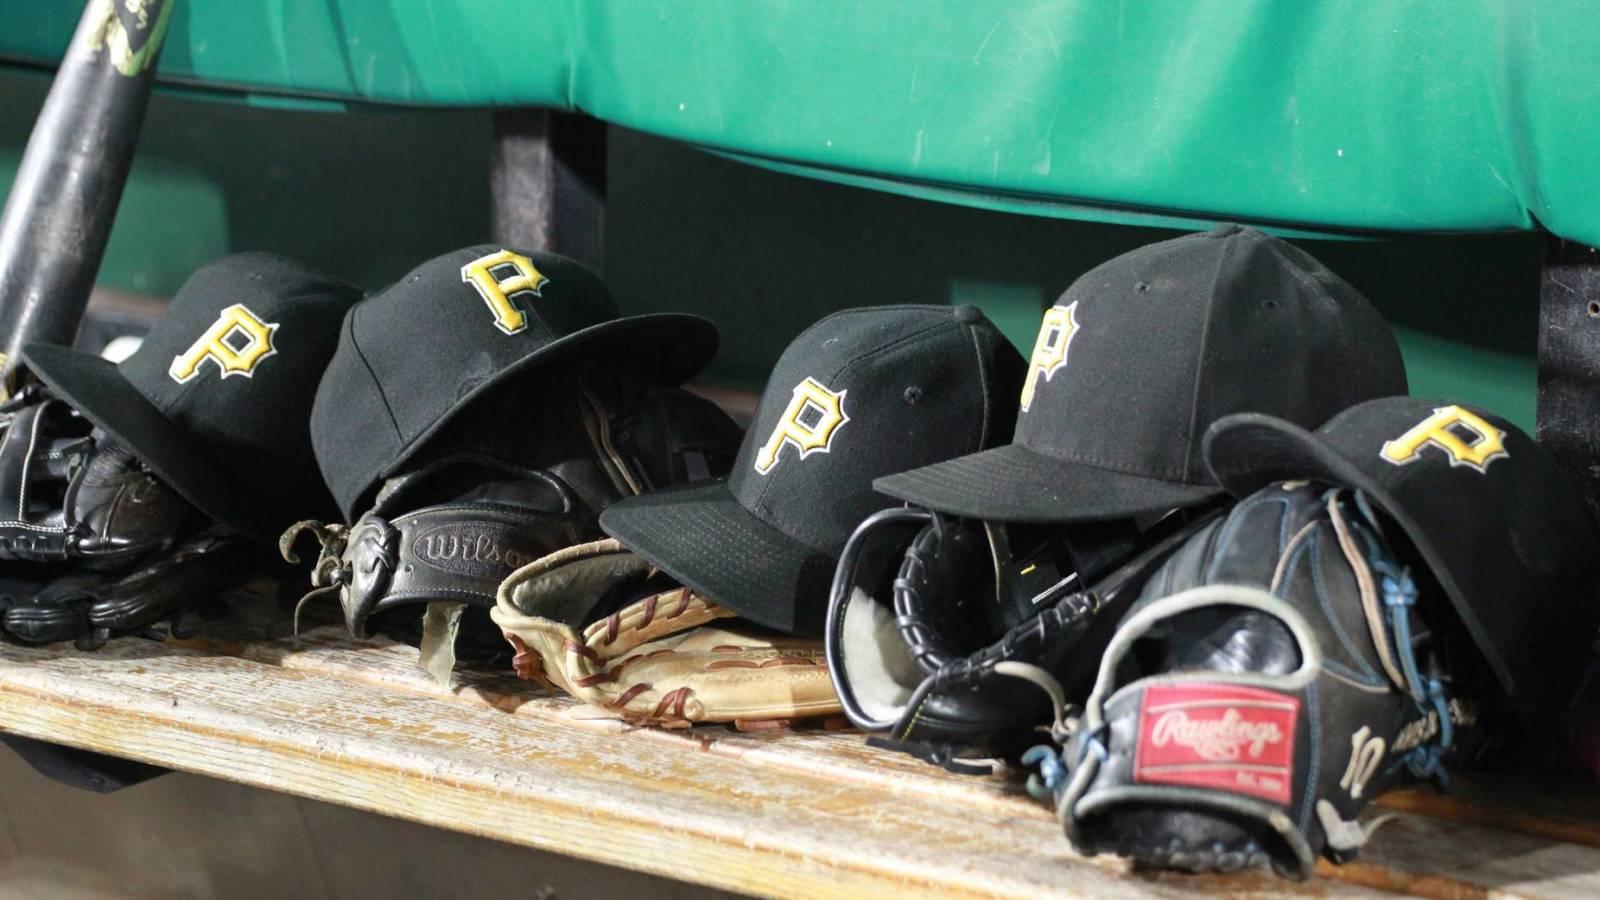 Pittsburgh Pirates' offseason reviewed